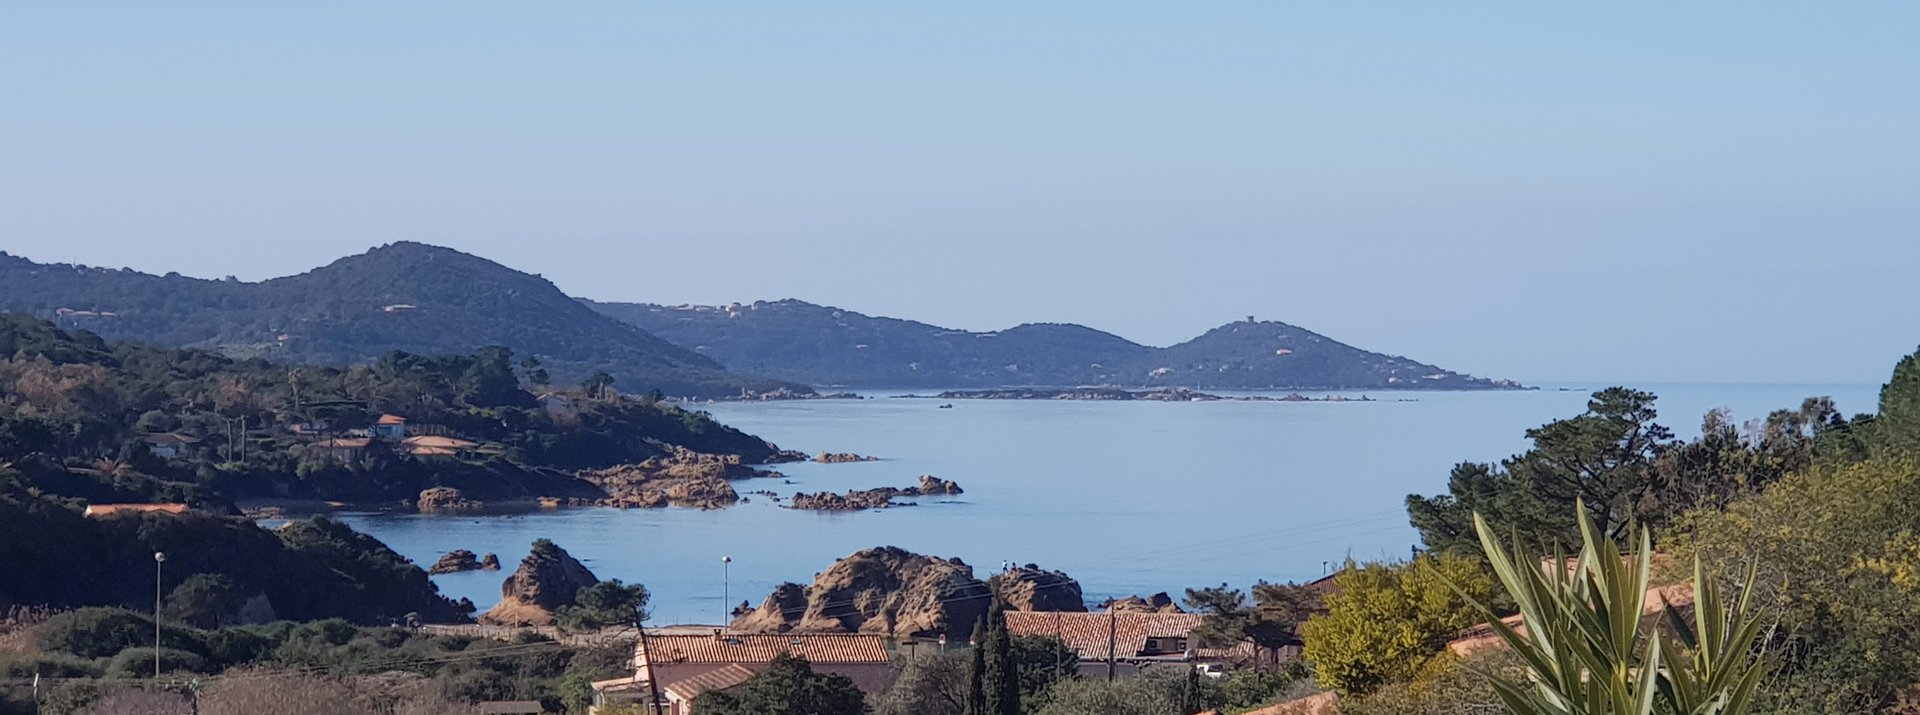 Villa 3 chambres, belle vue mer au Rupione-Plage à Pietrosella